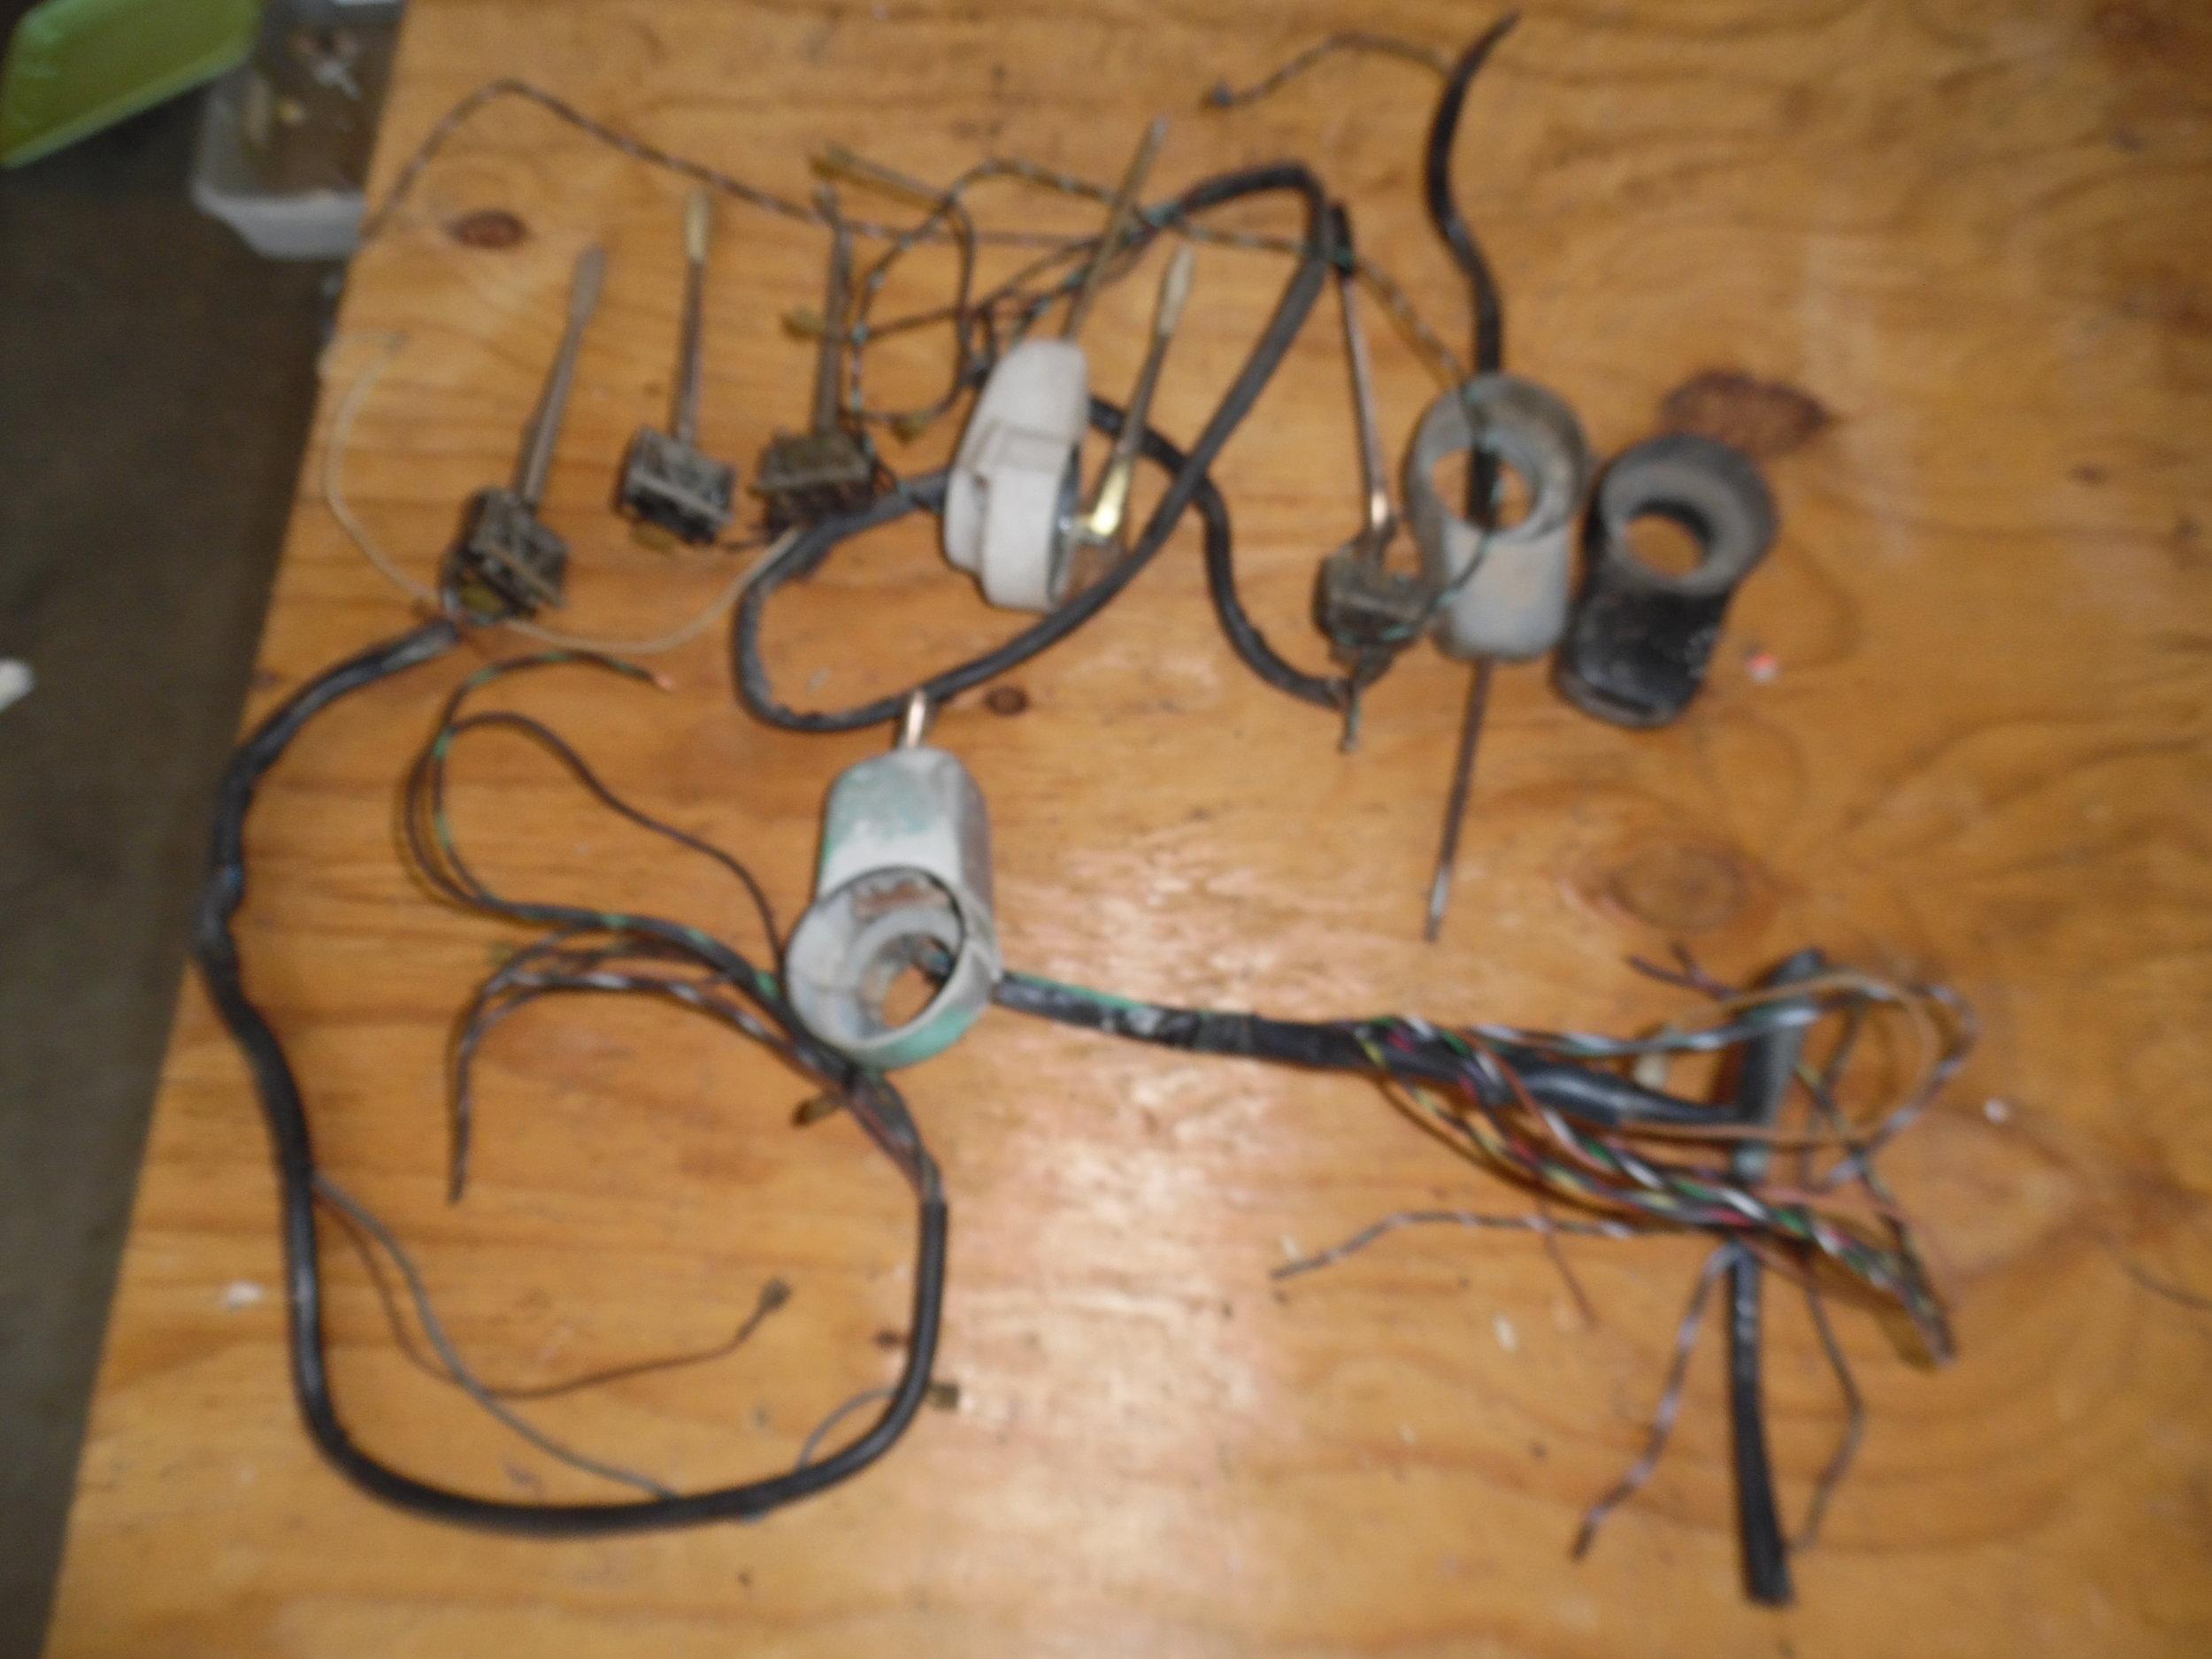 split bus parts 012.JPG